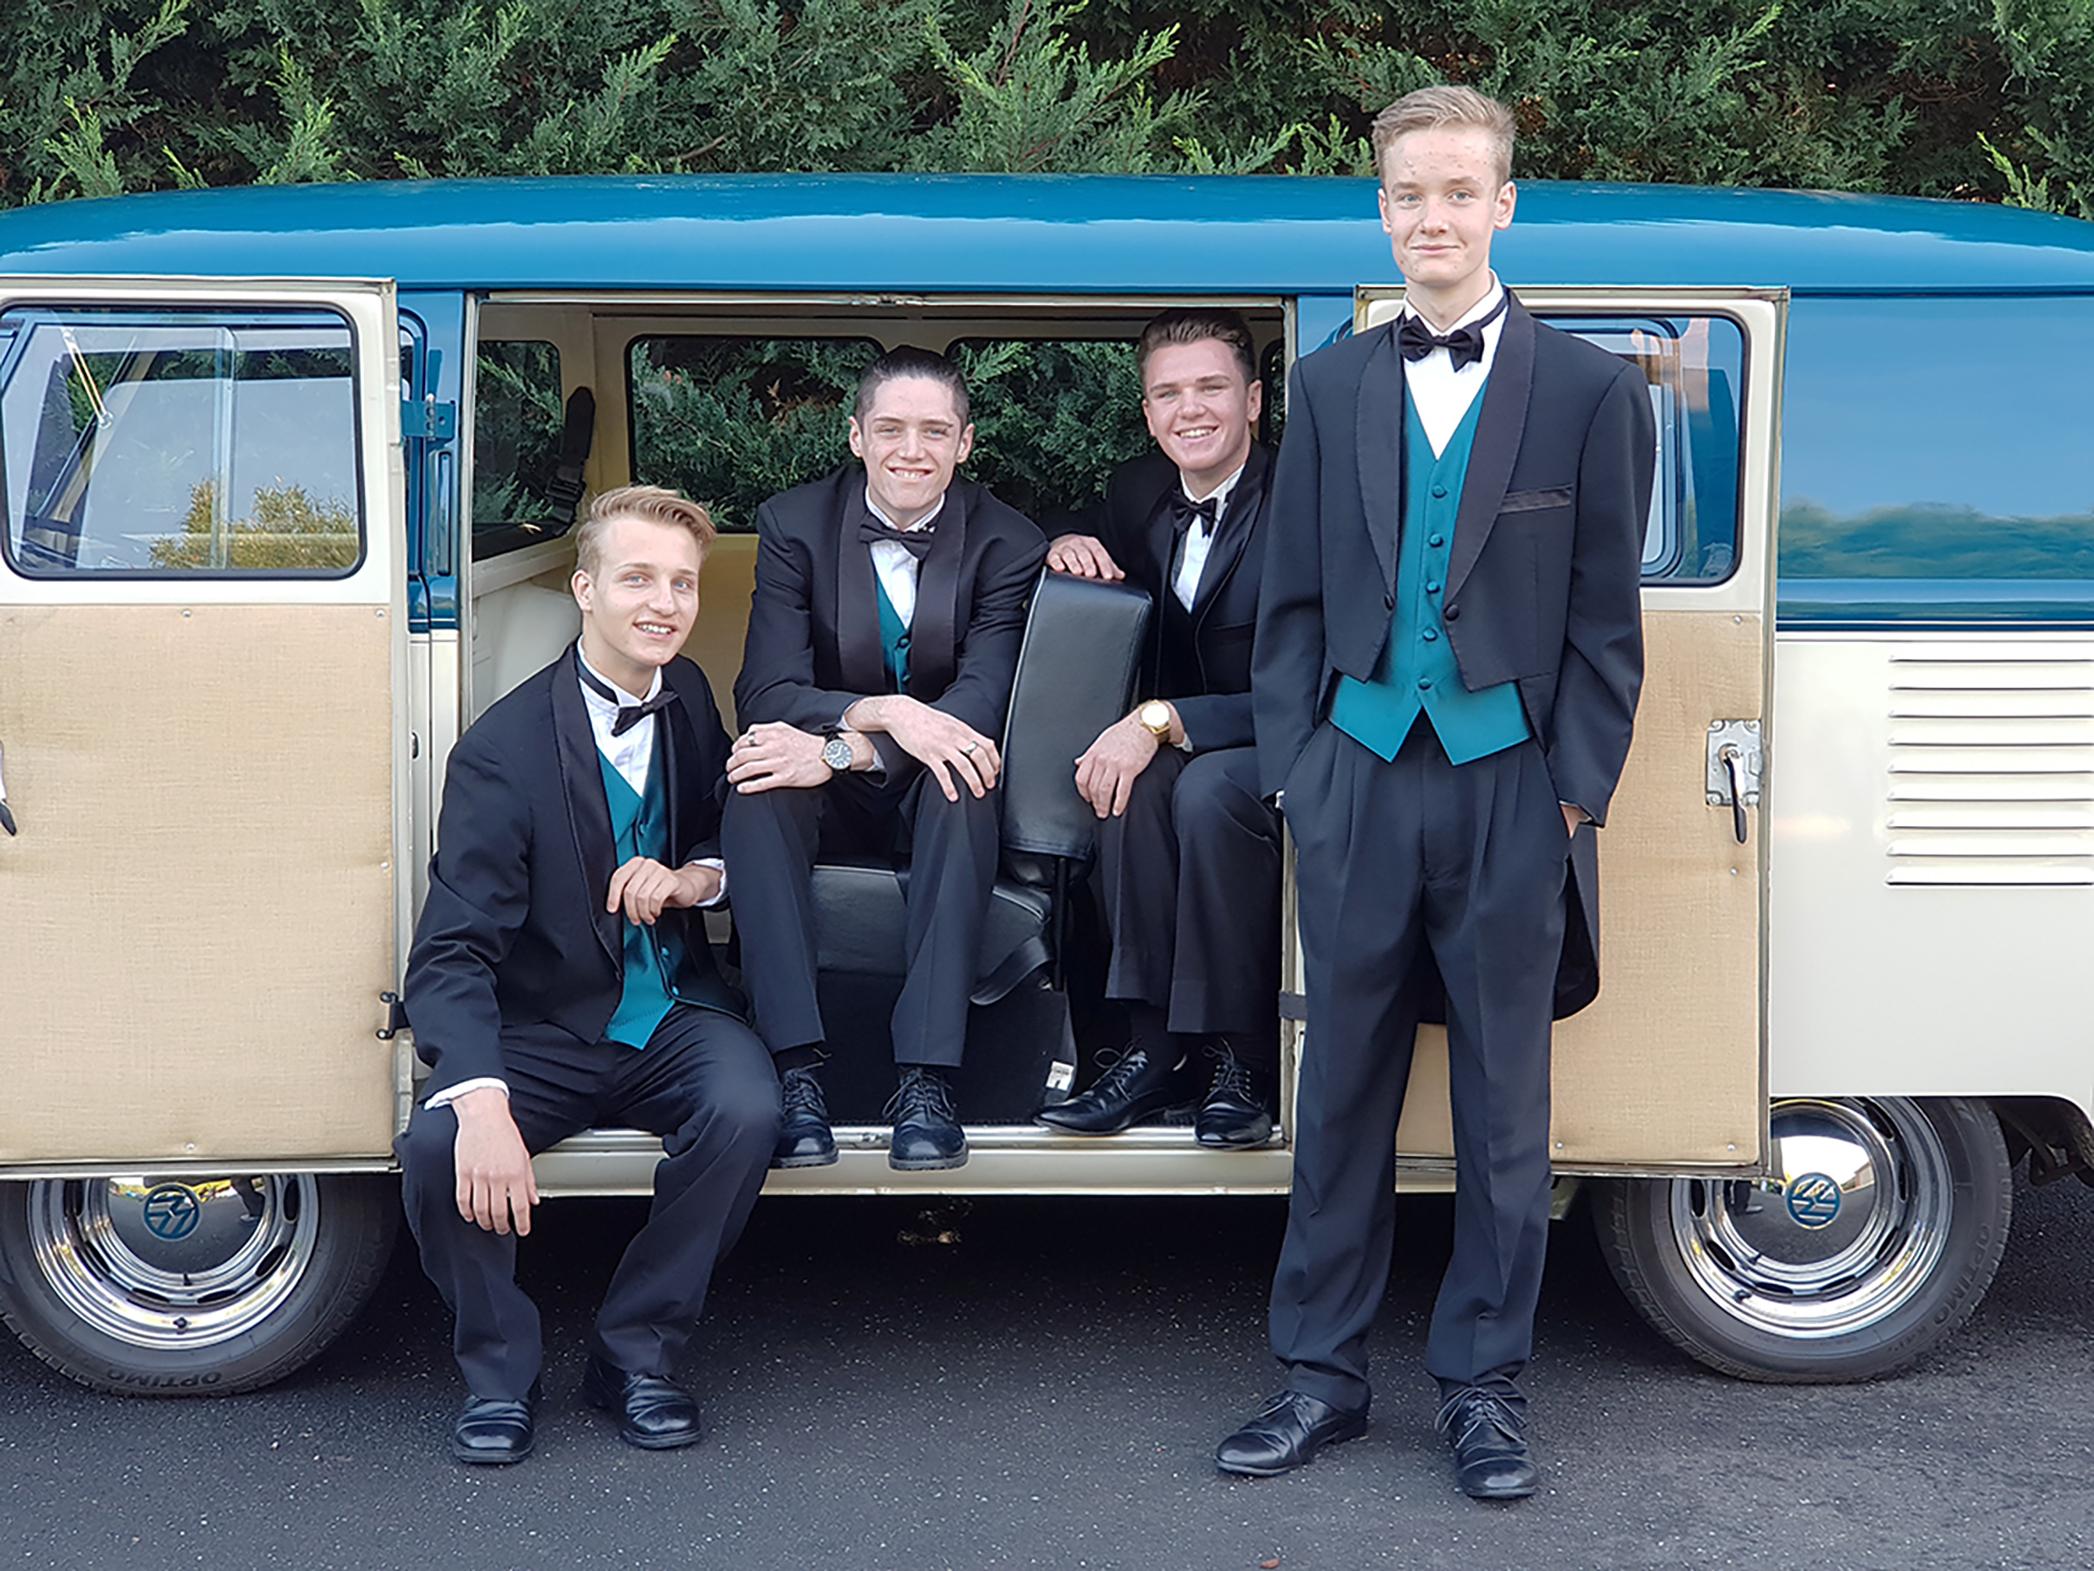 Casey Grammer Debutante Ball - Photo's by Kombi & Beetle Wedding & Debutante Car Hire (36)